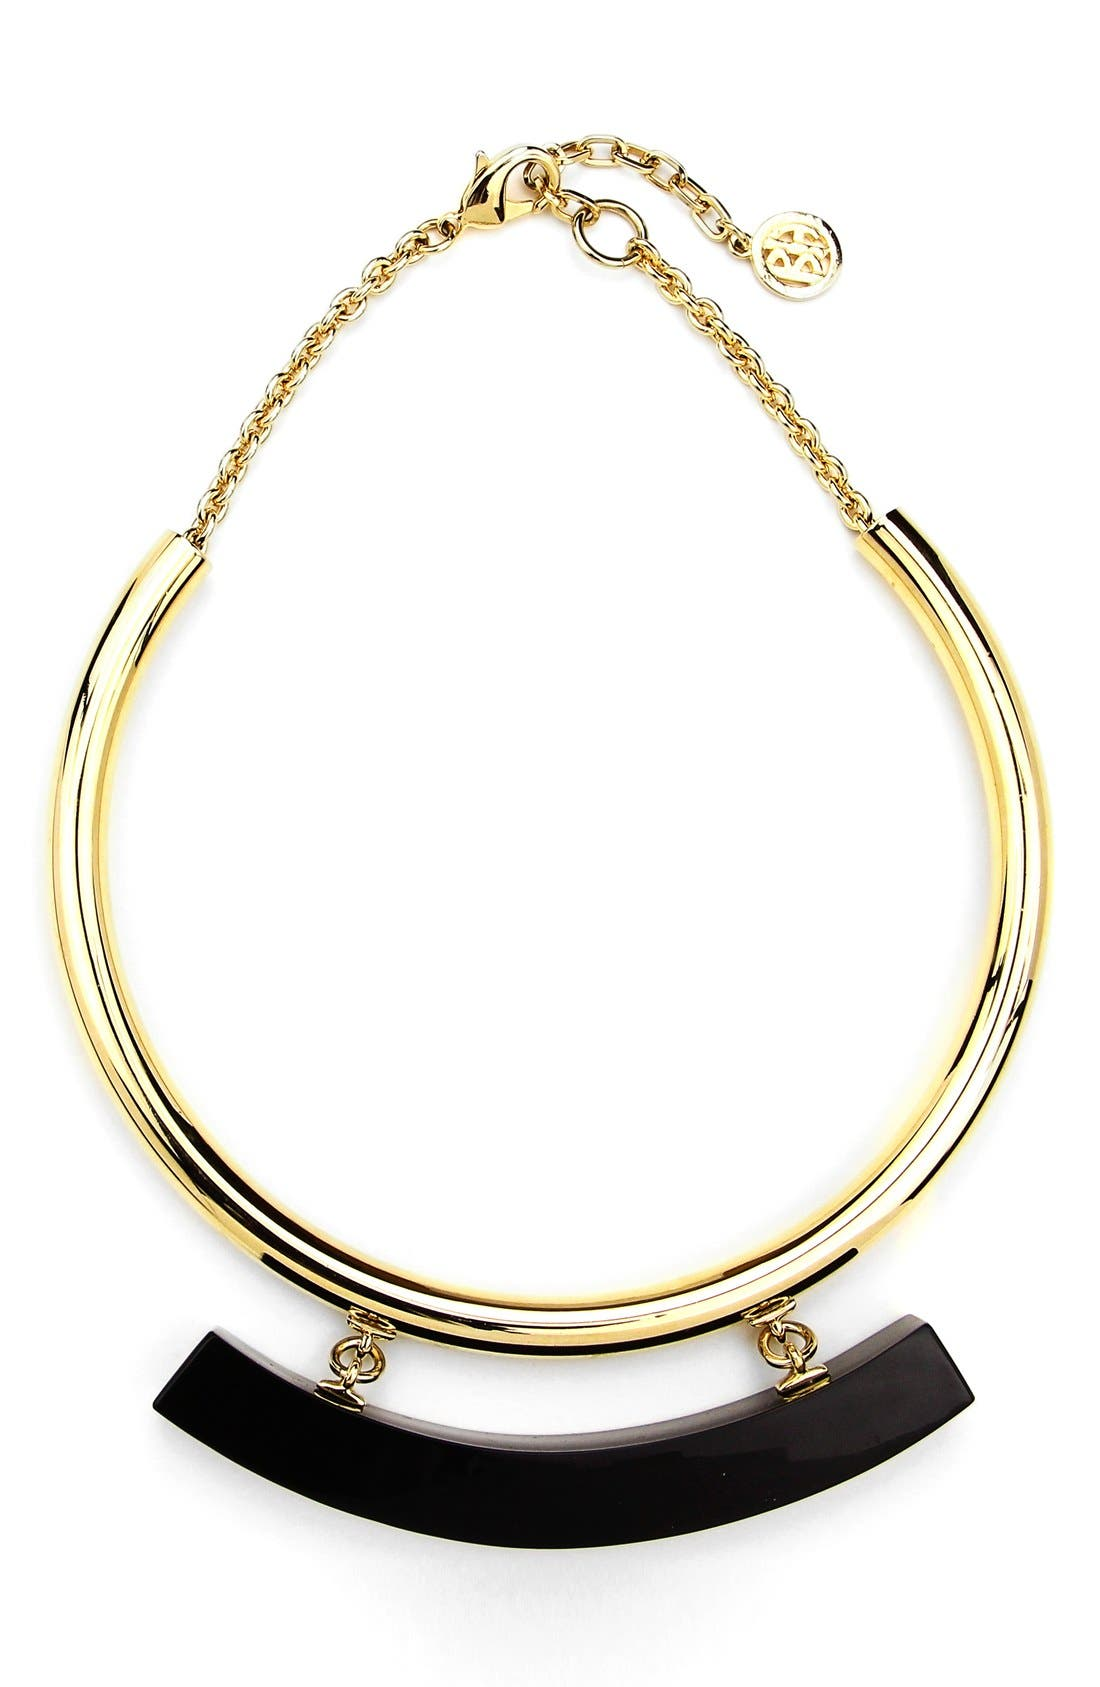 Ben-Amun Collar Necklace